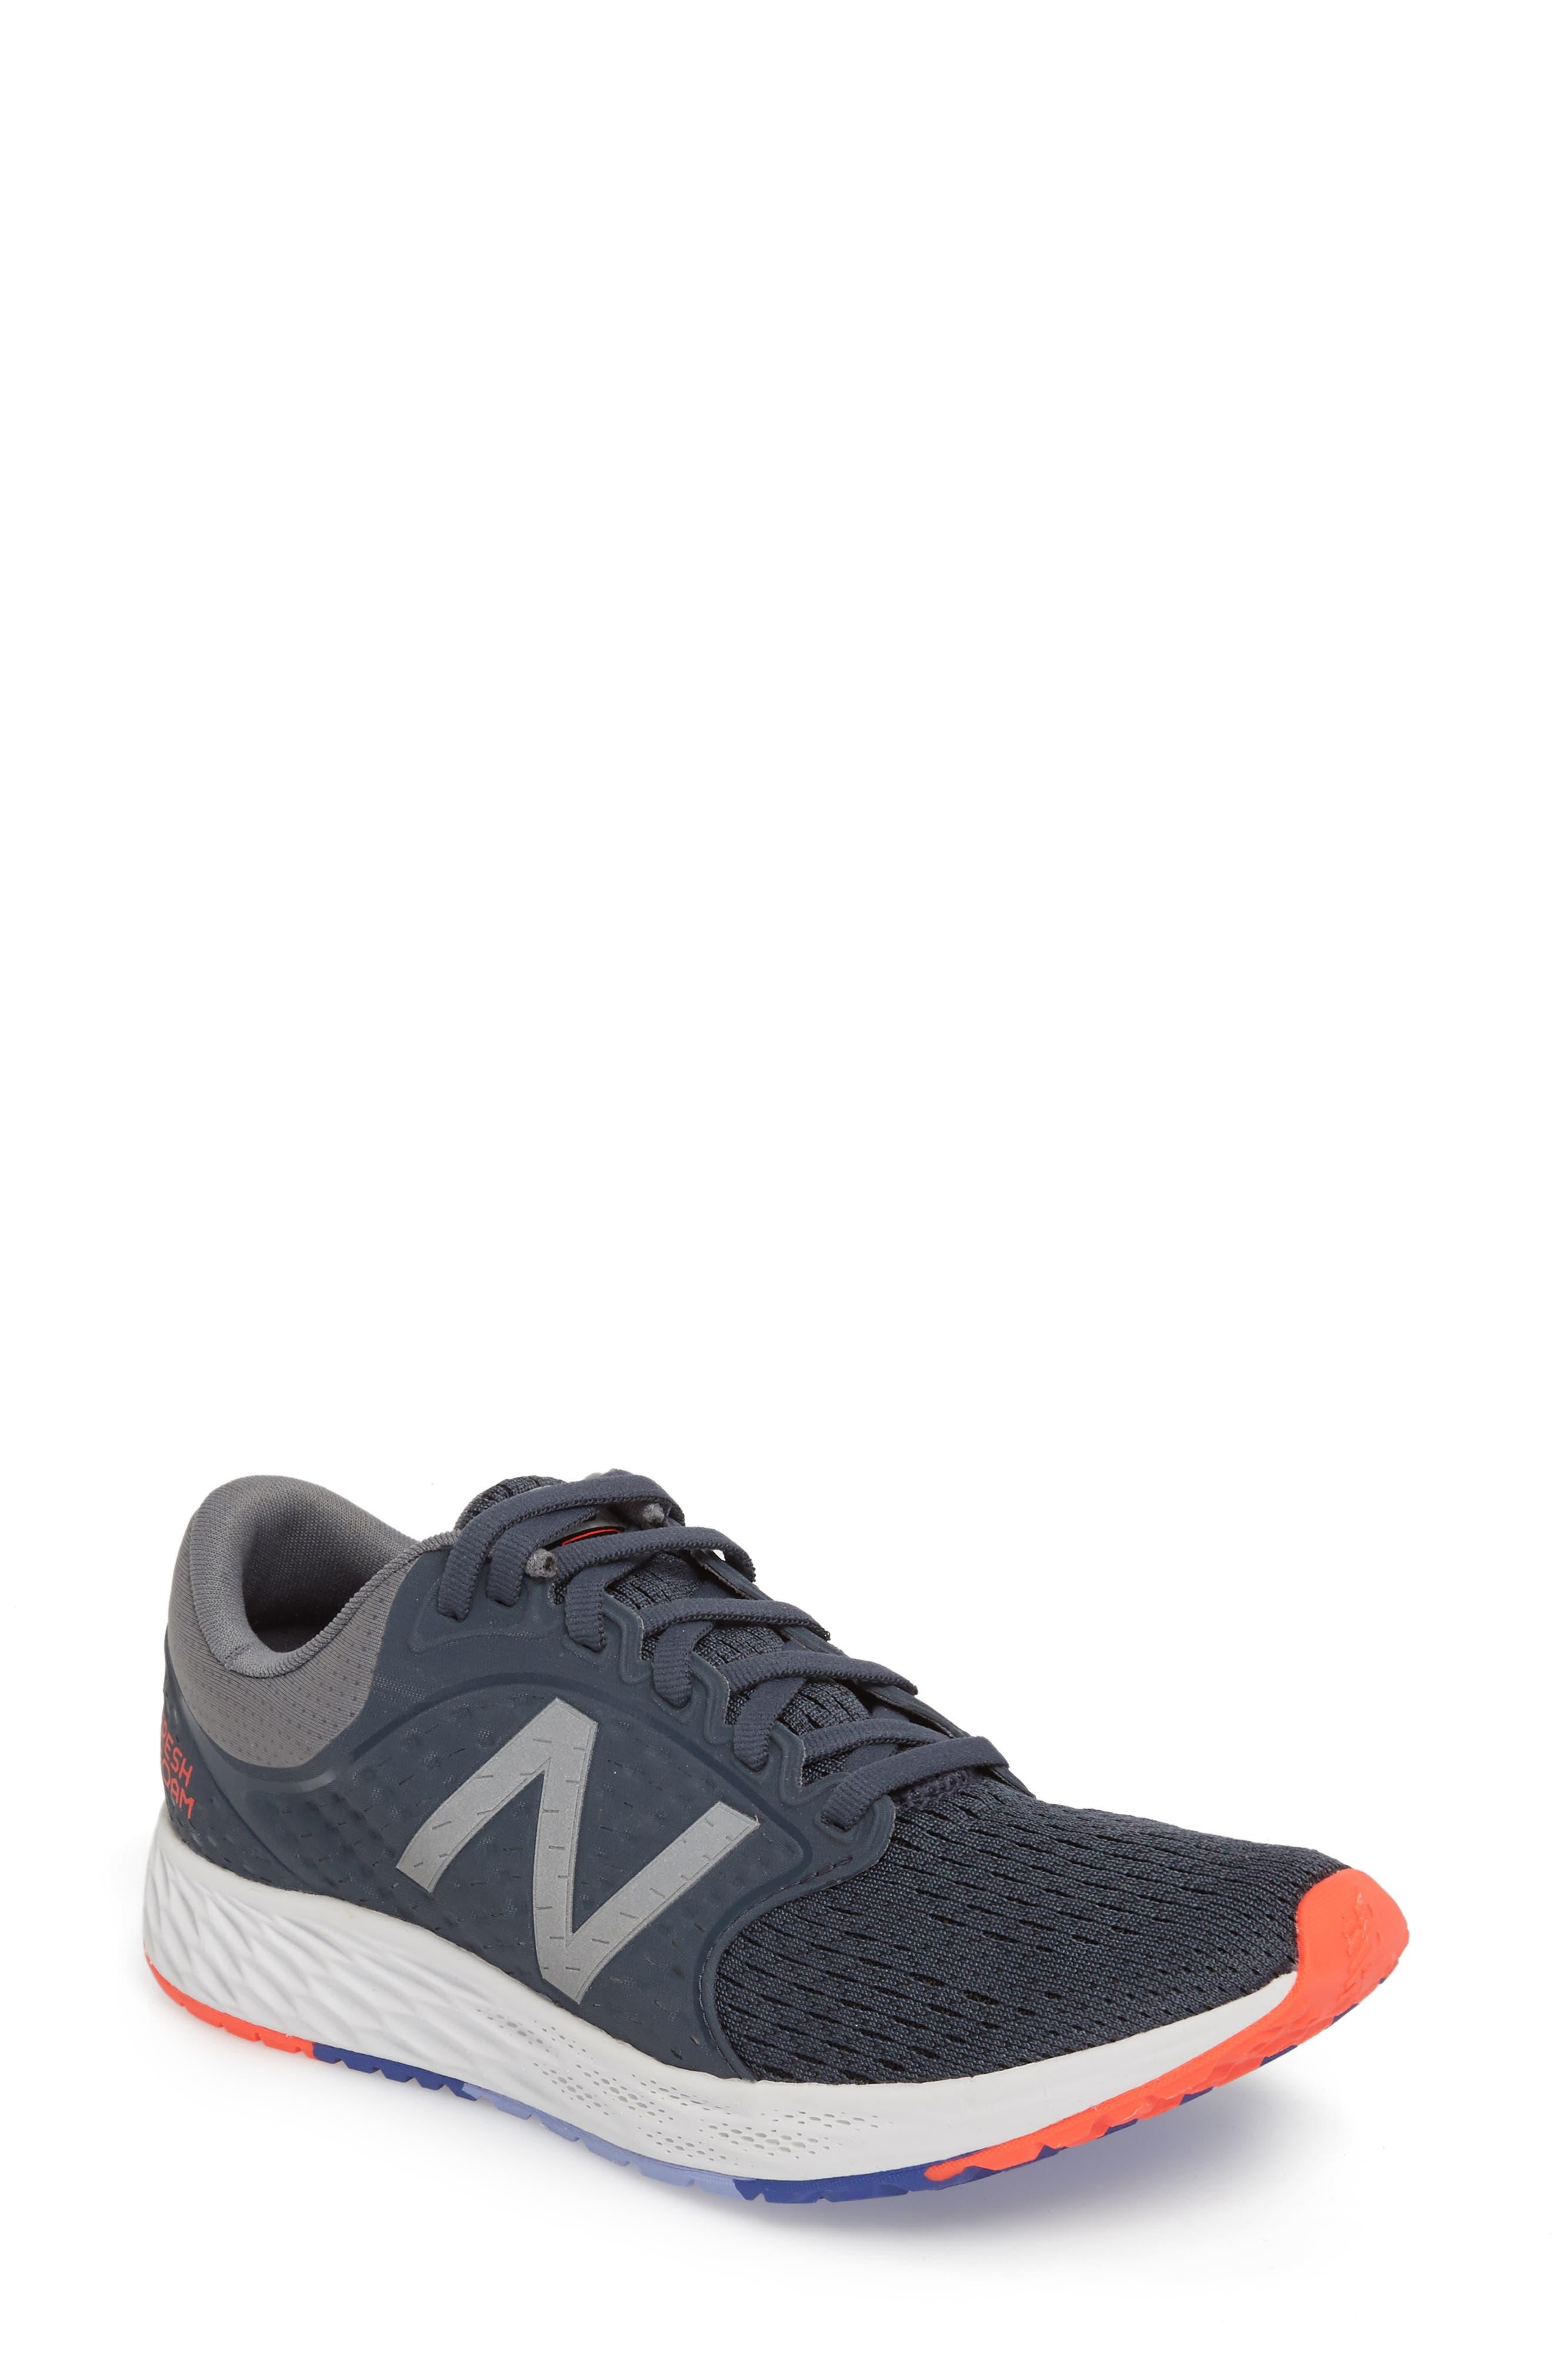 New Balance Fresh Foam Zante v4 Running Shoe (Women)